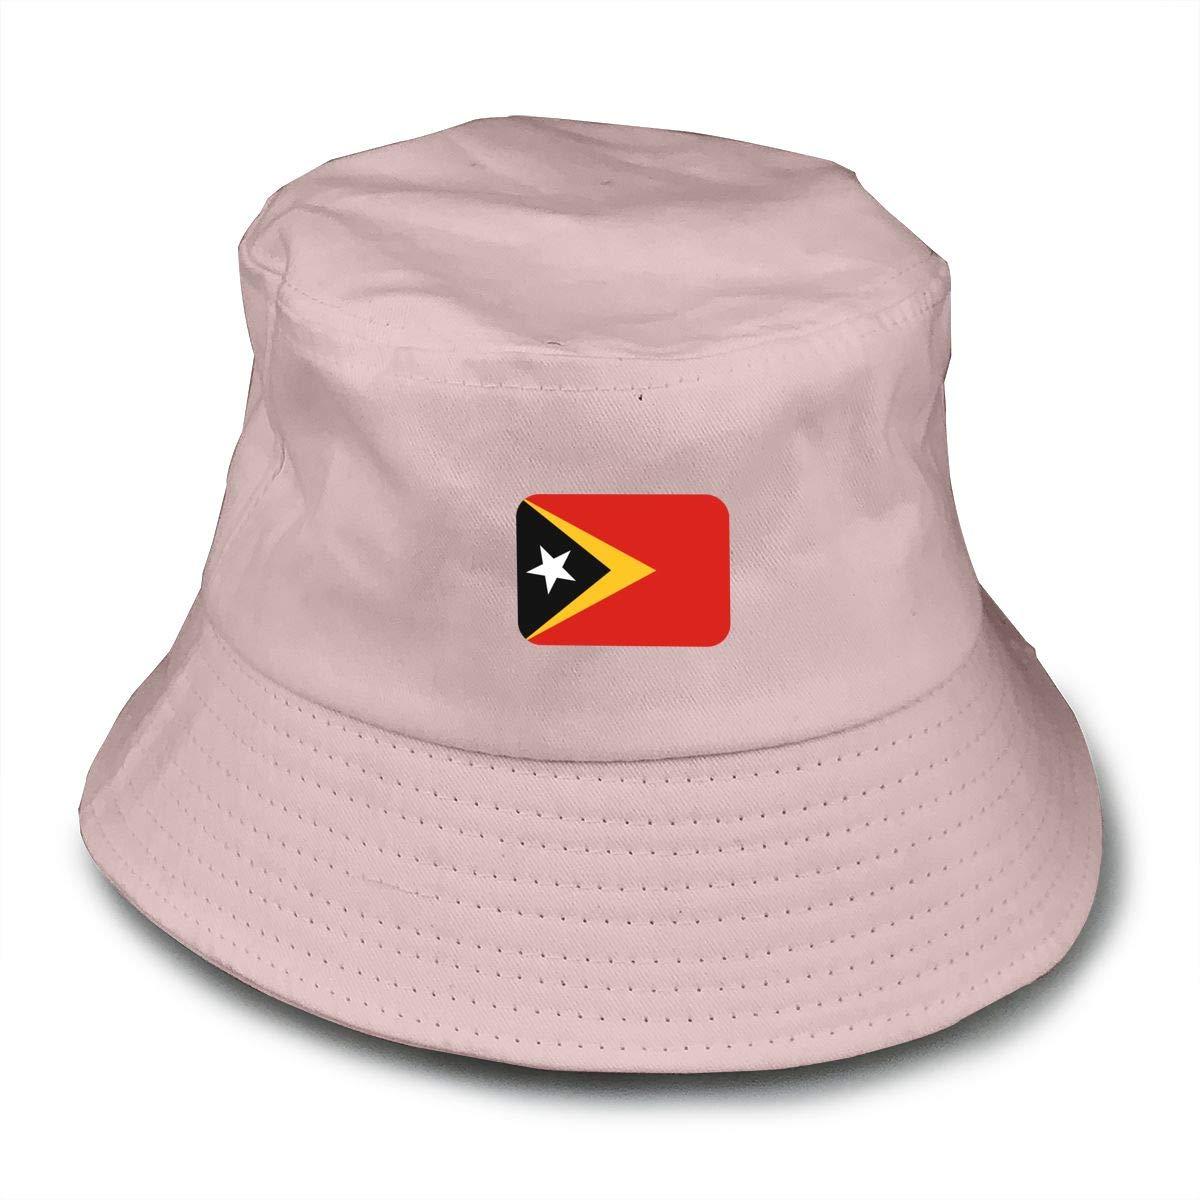 NDFGR East-Timor Unisex Cotton Packable Black Travel Bucket Hat Fishing Cap